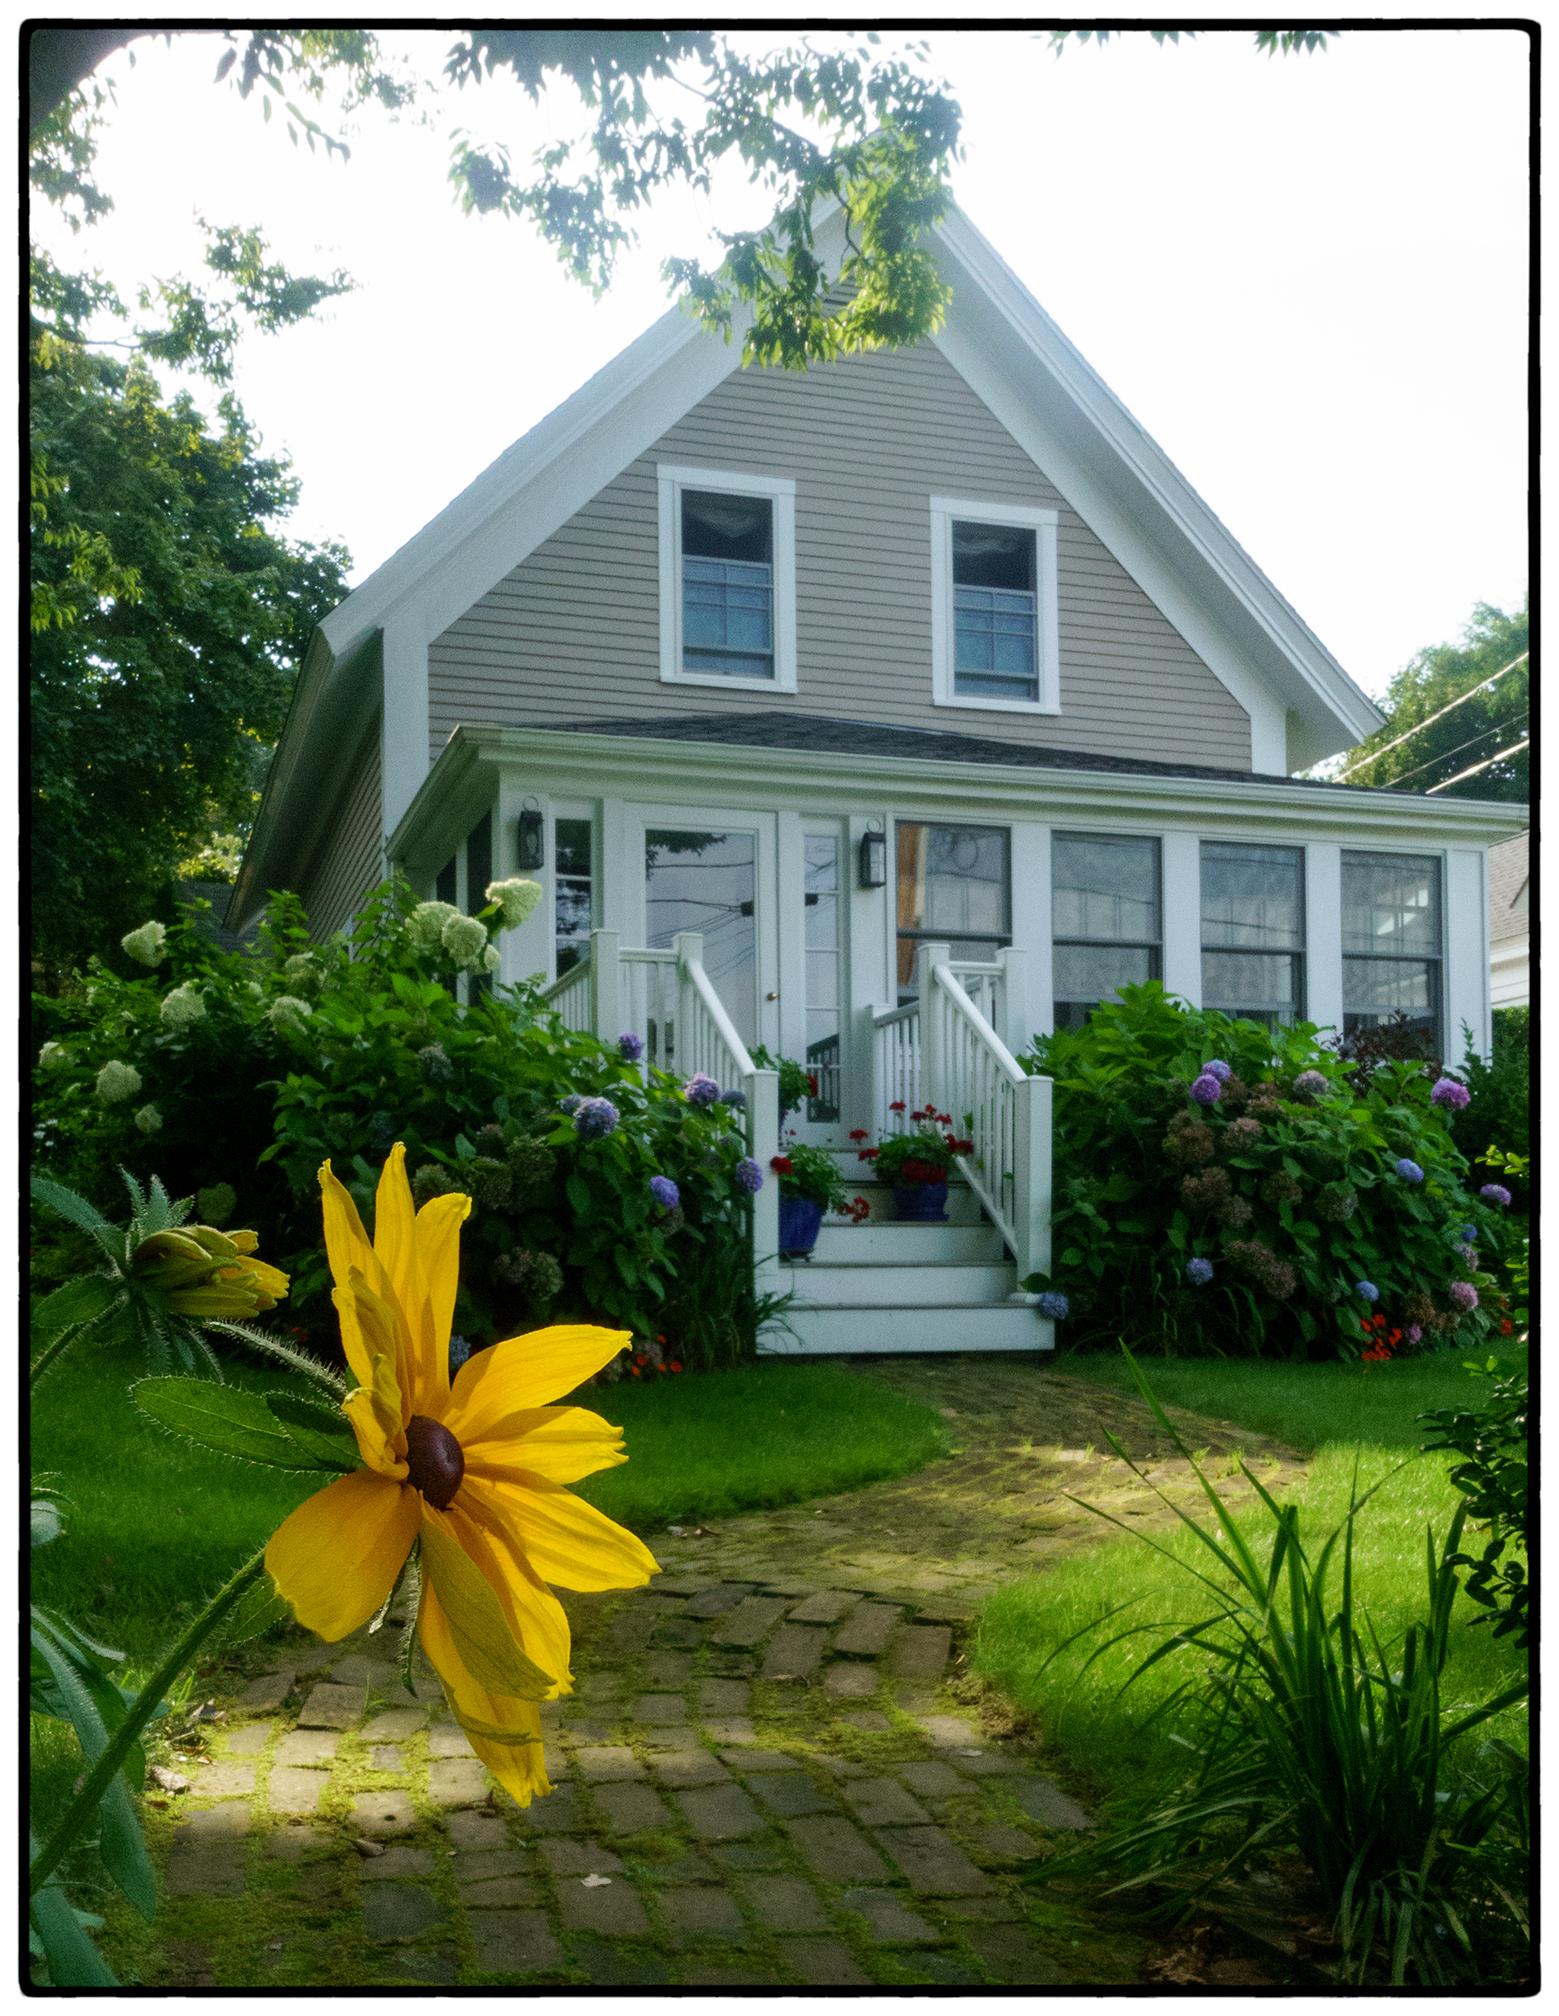 House, Wellfleet